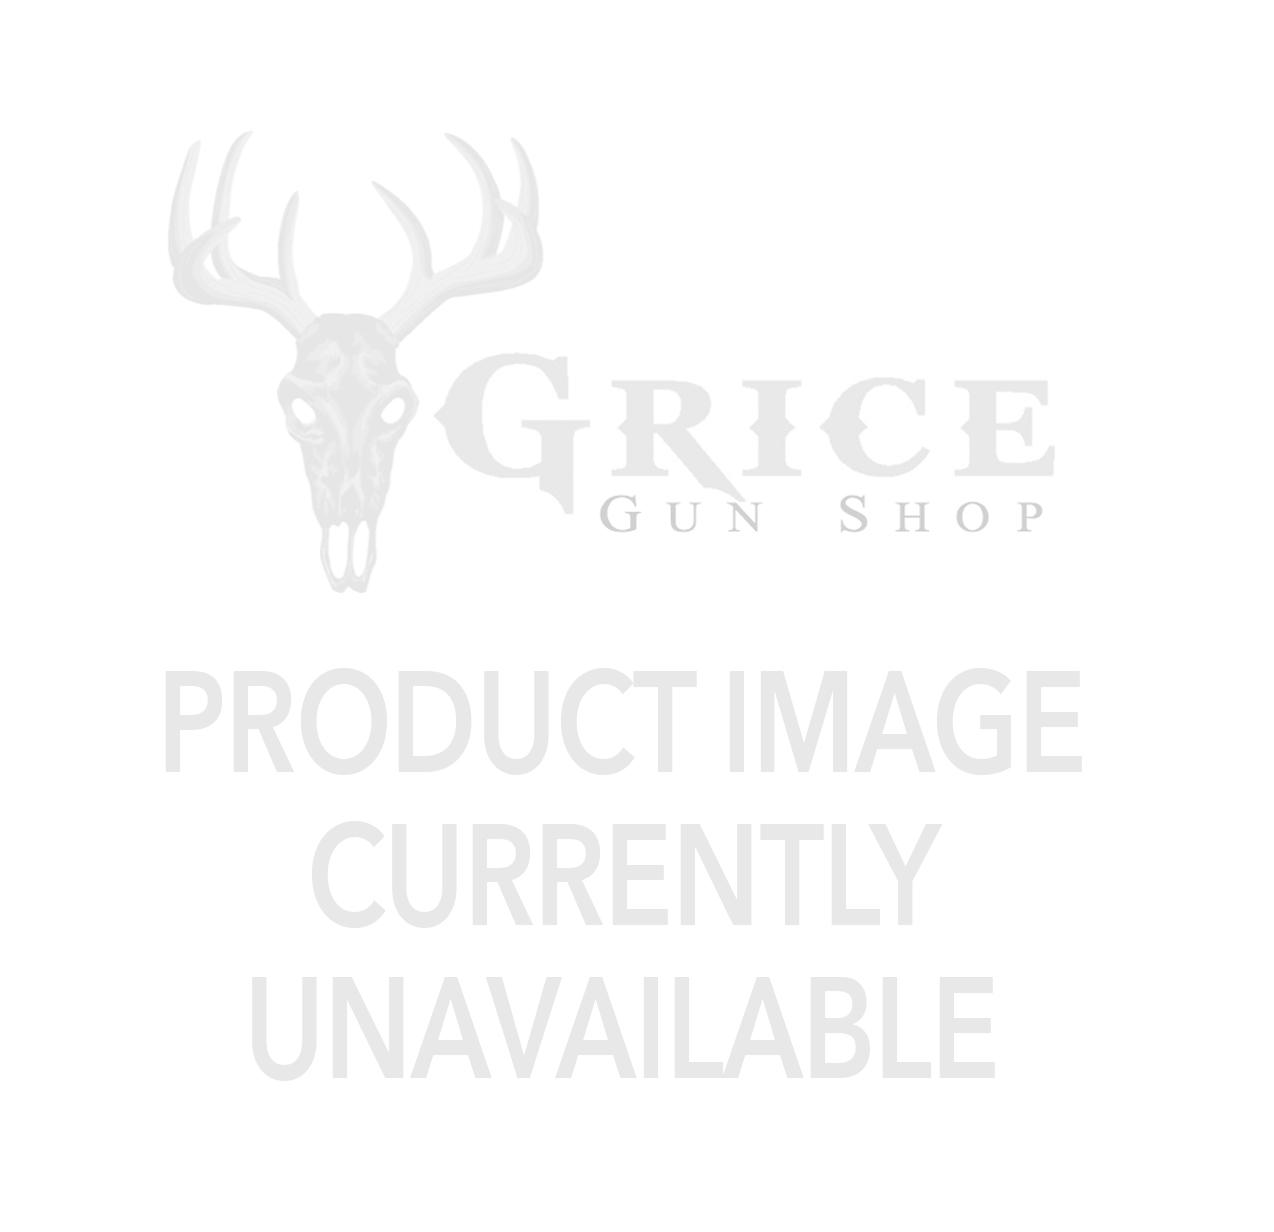 Millet - 2pc Base - Aluminum AngleLoc X-Bolt Matte